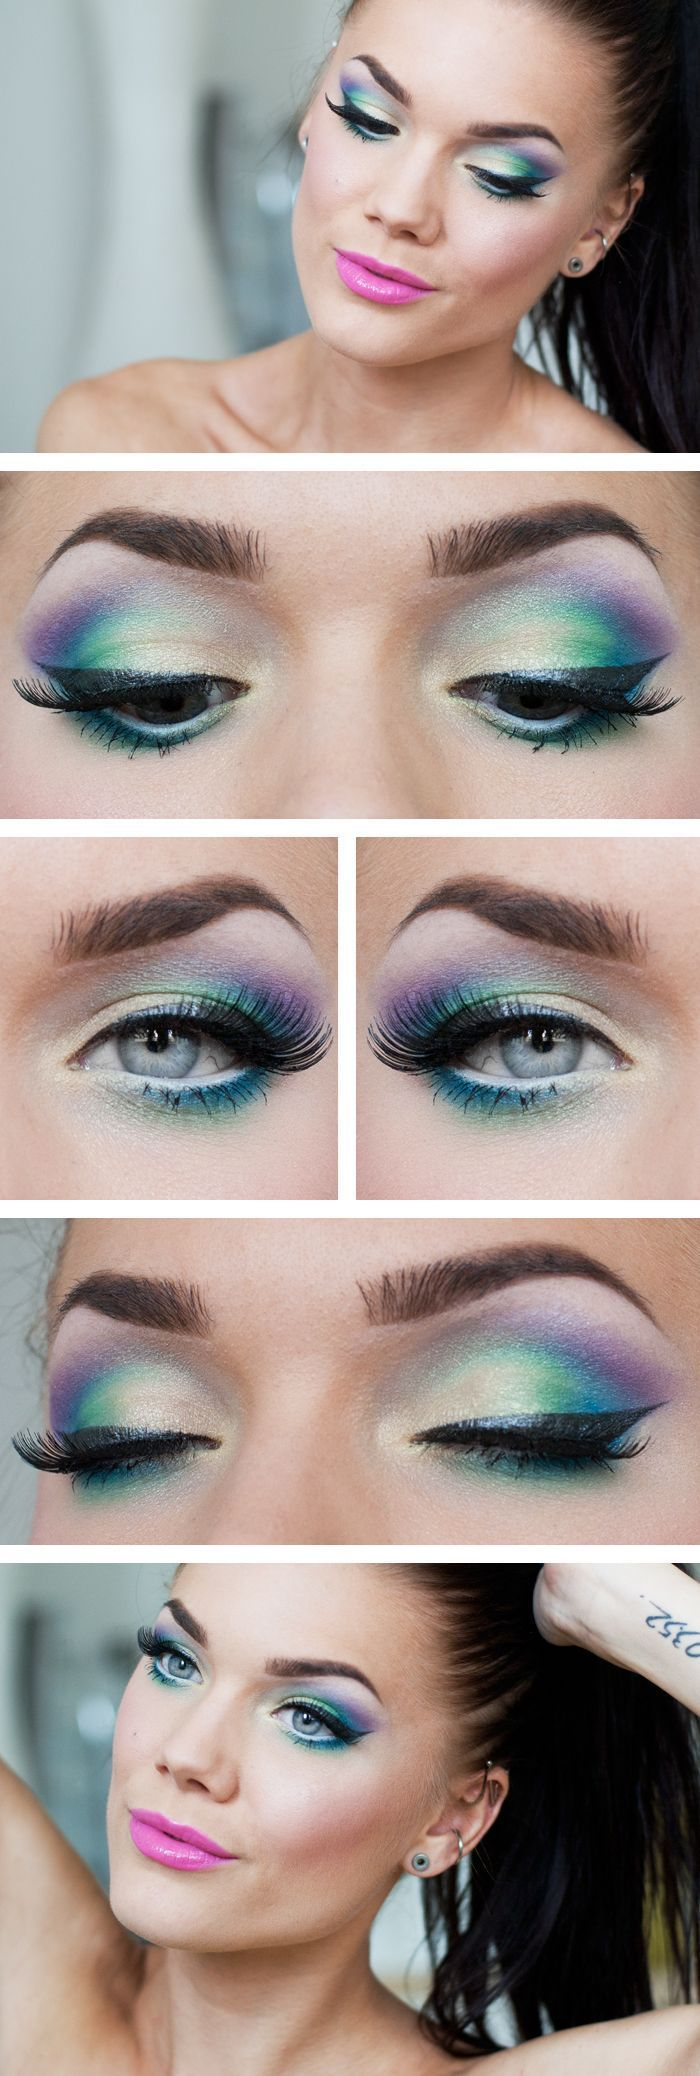 makeupit.com/Zykrd | Don't let sensitive skin stop you from applying makeup!